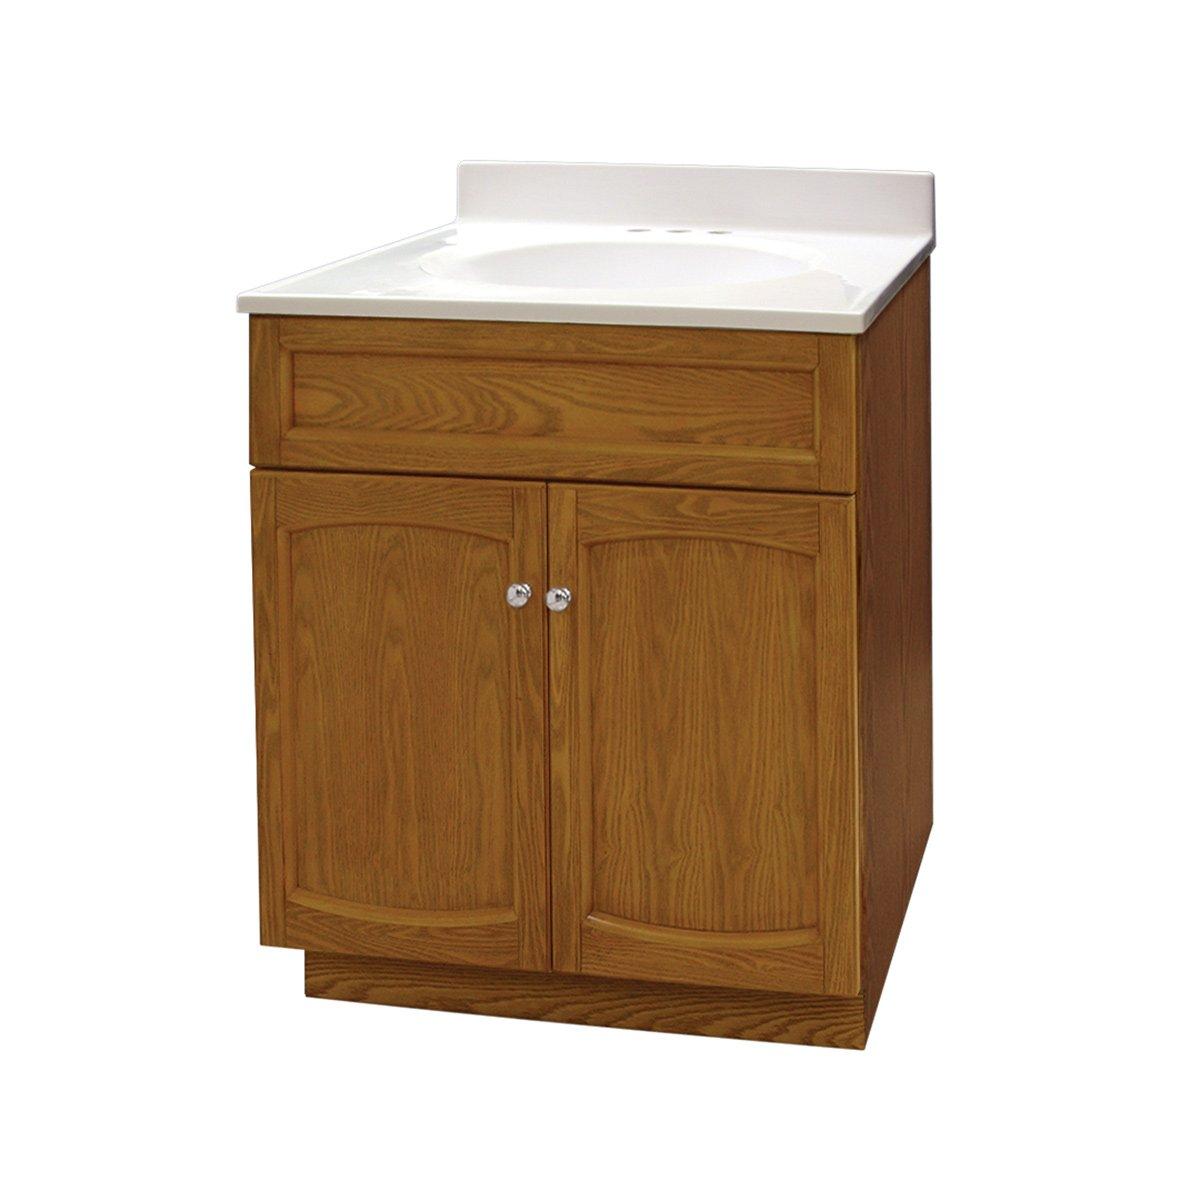 Foremost heo2418 heartland 24 inch oak vanity with top 30 Bathroom vanity and medicine cabinet combo